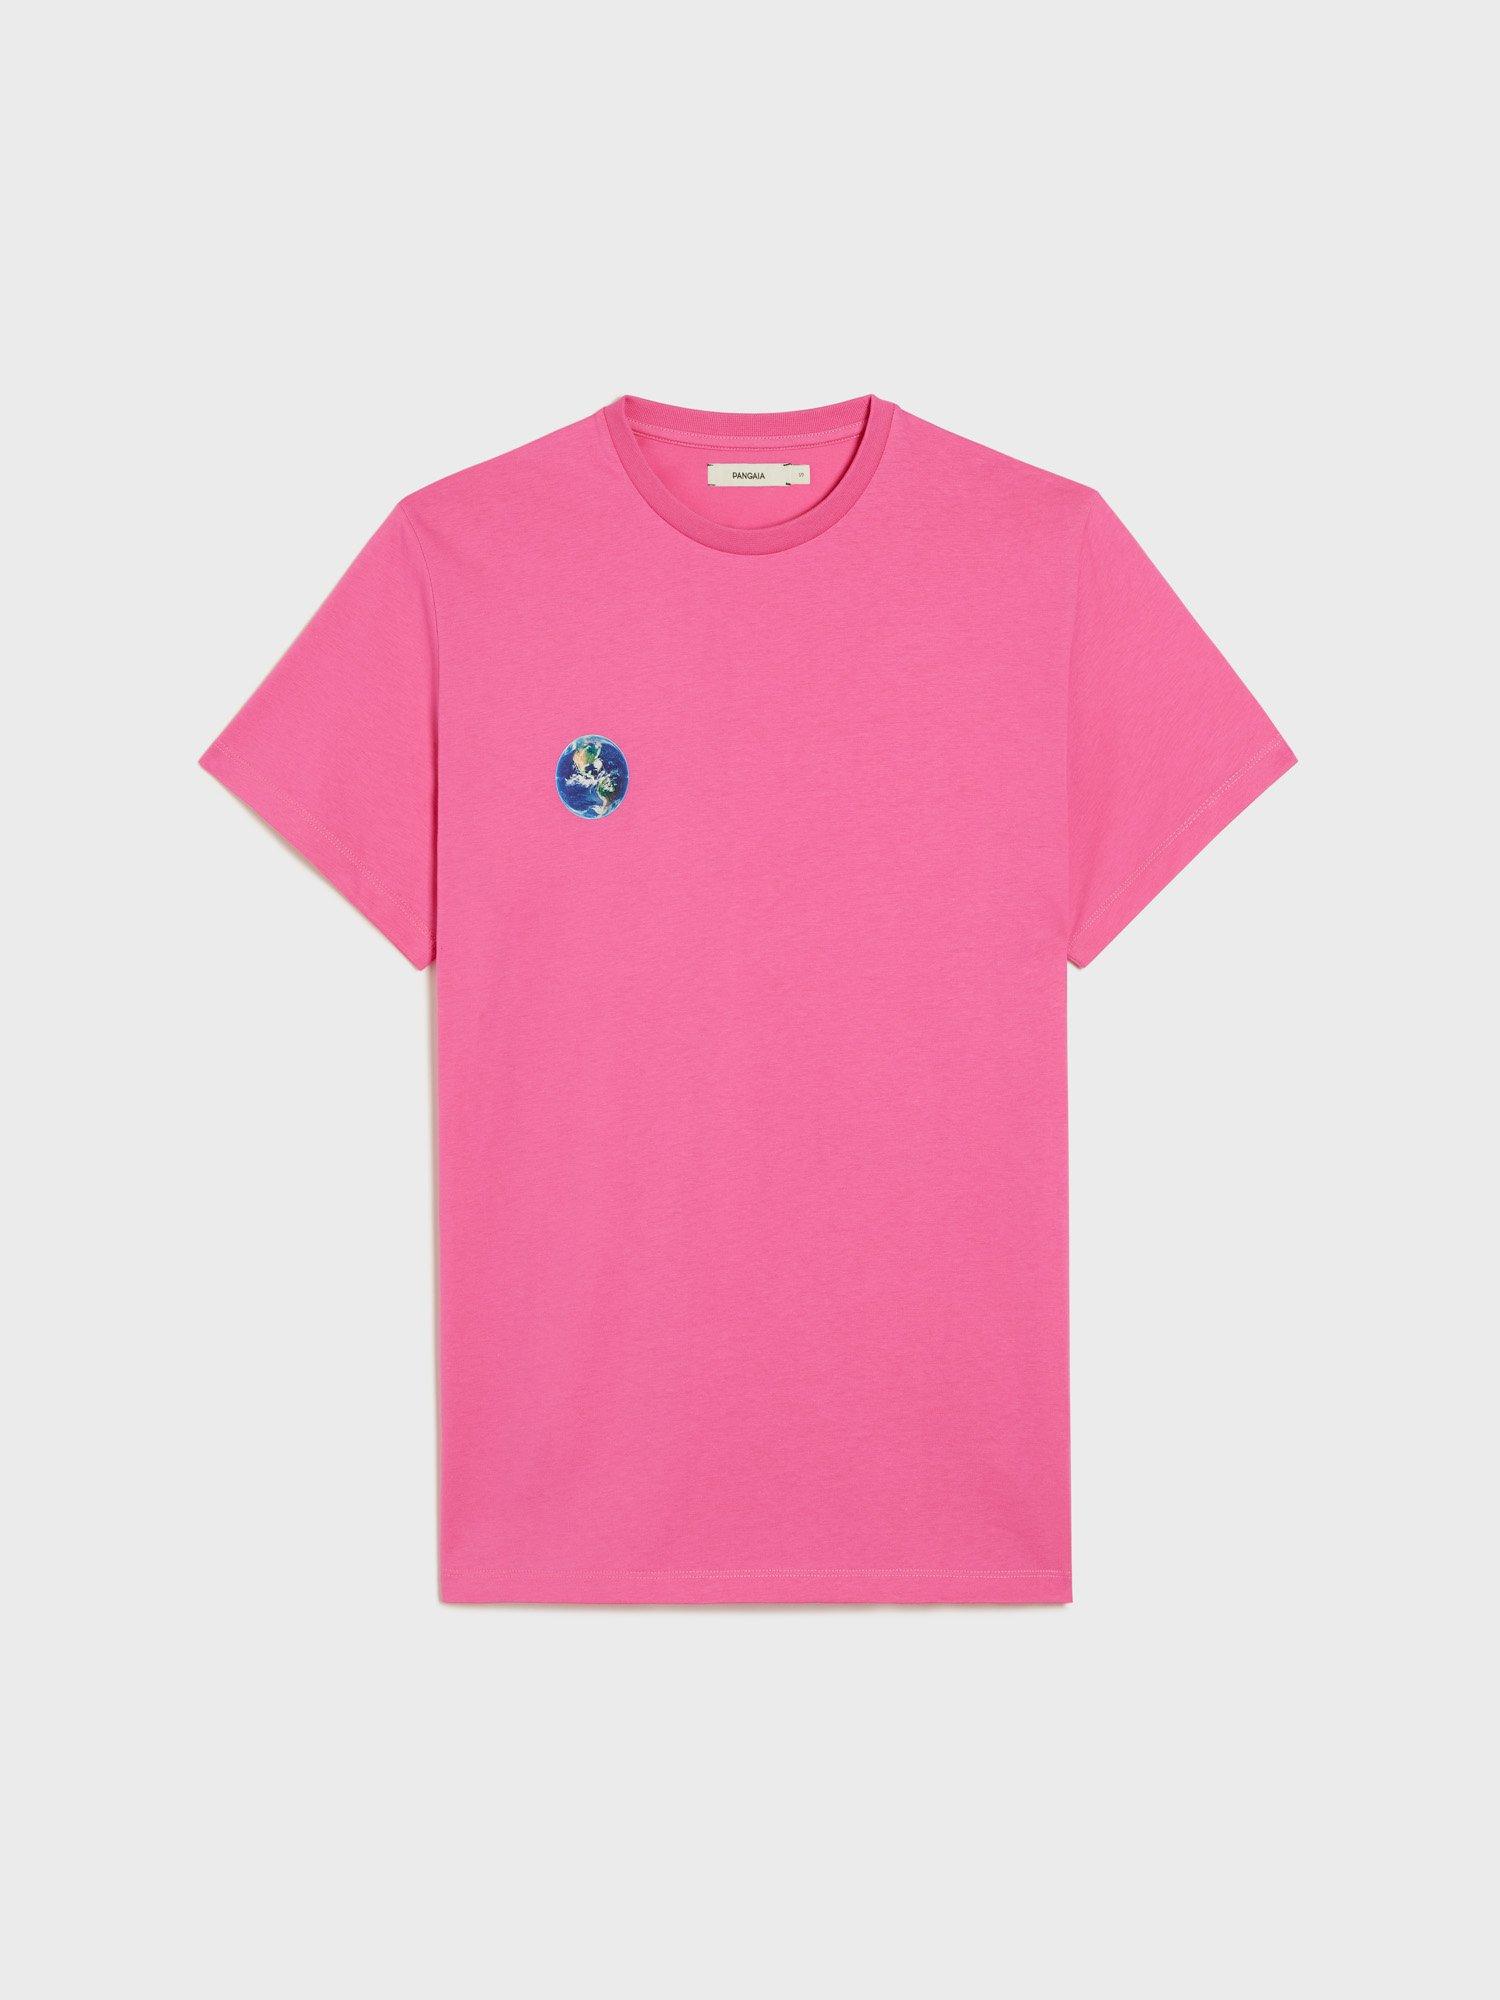 PPRMINT™ Organic Cotton Mother Earth T-shirt